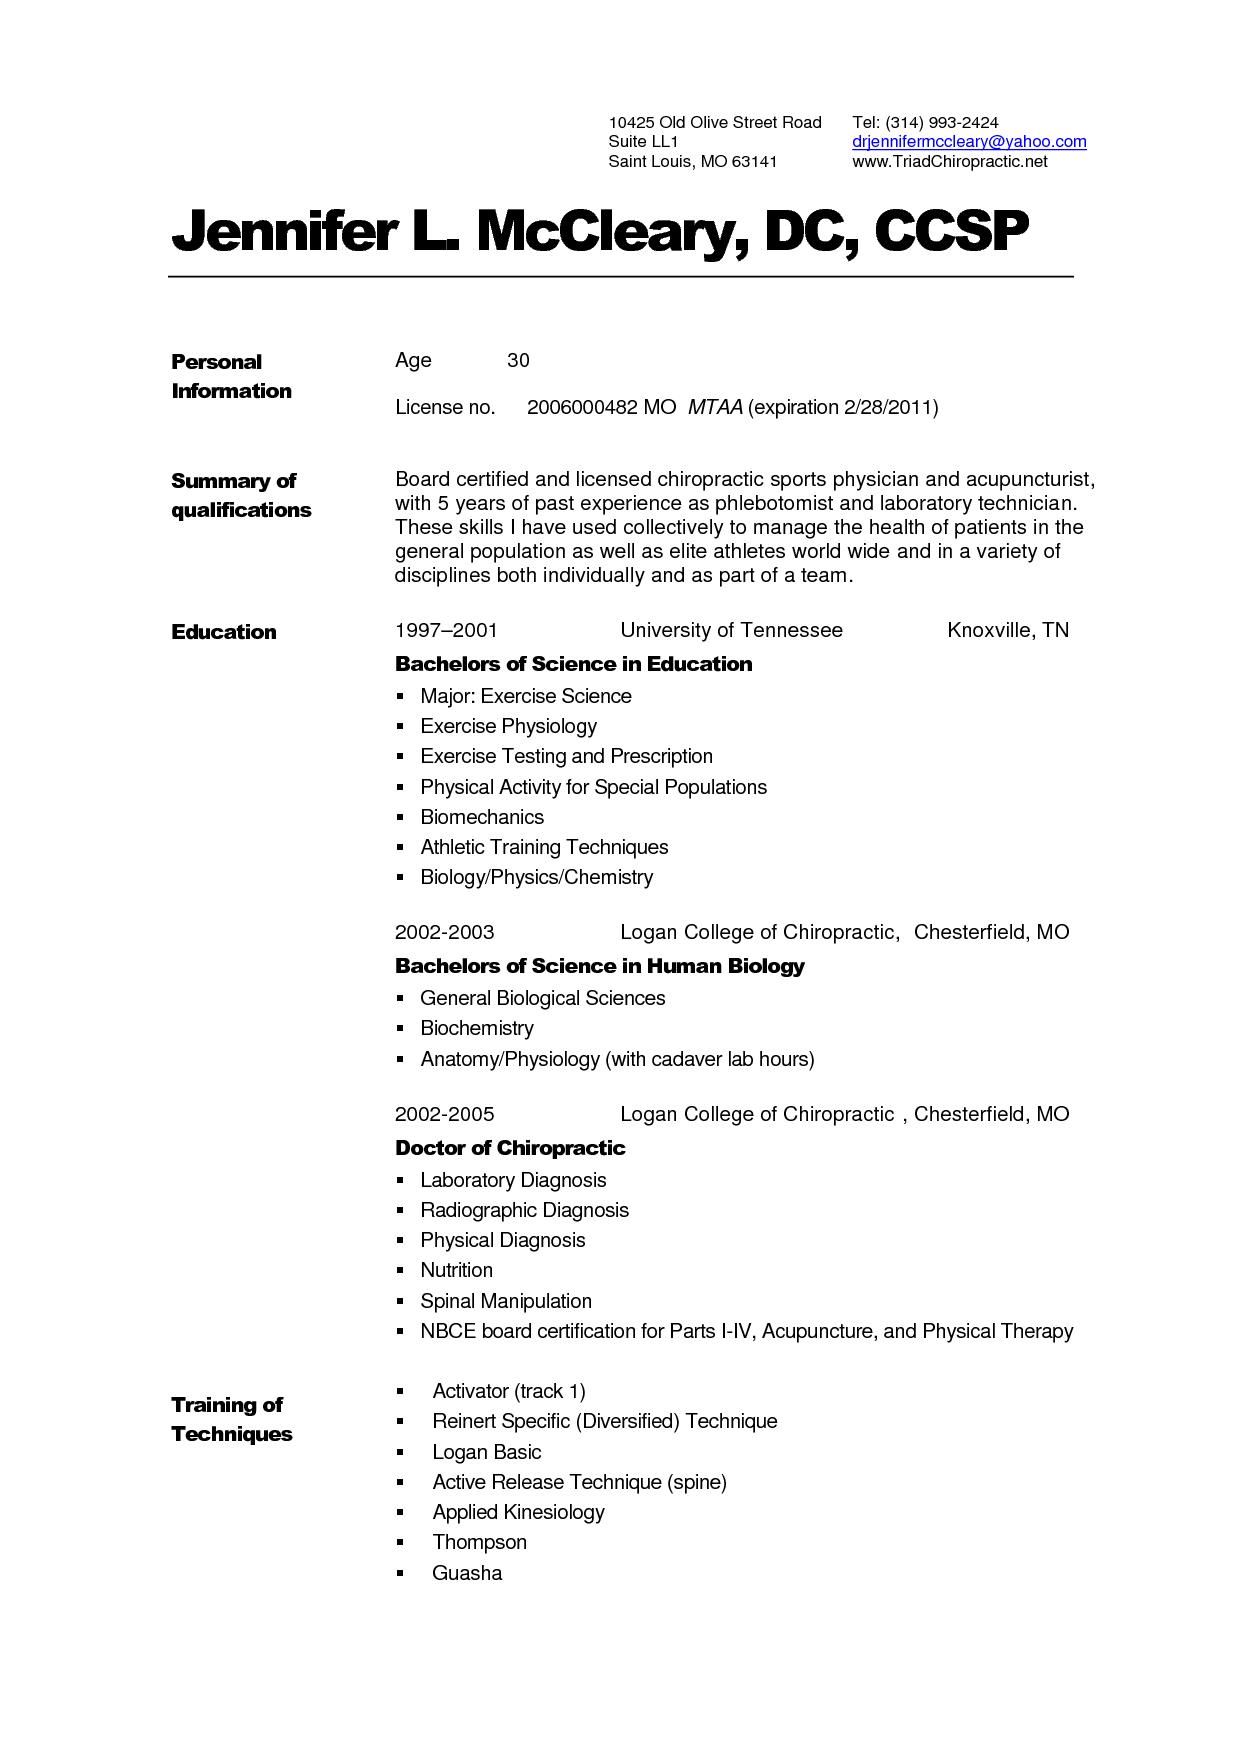 Example Chronological Resume Additional Skills Doc Sample Cover  Examples Of Chronological Resumes